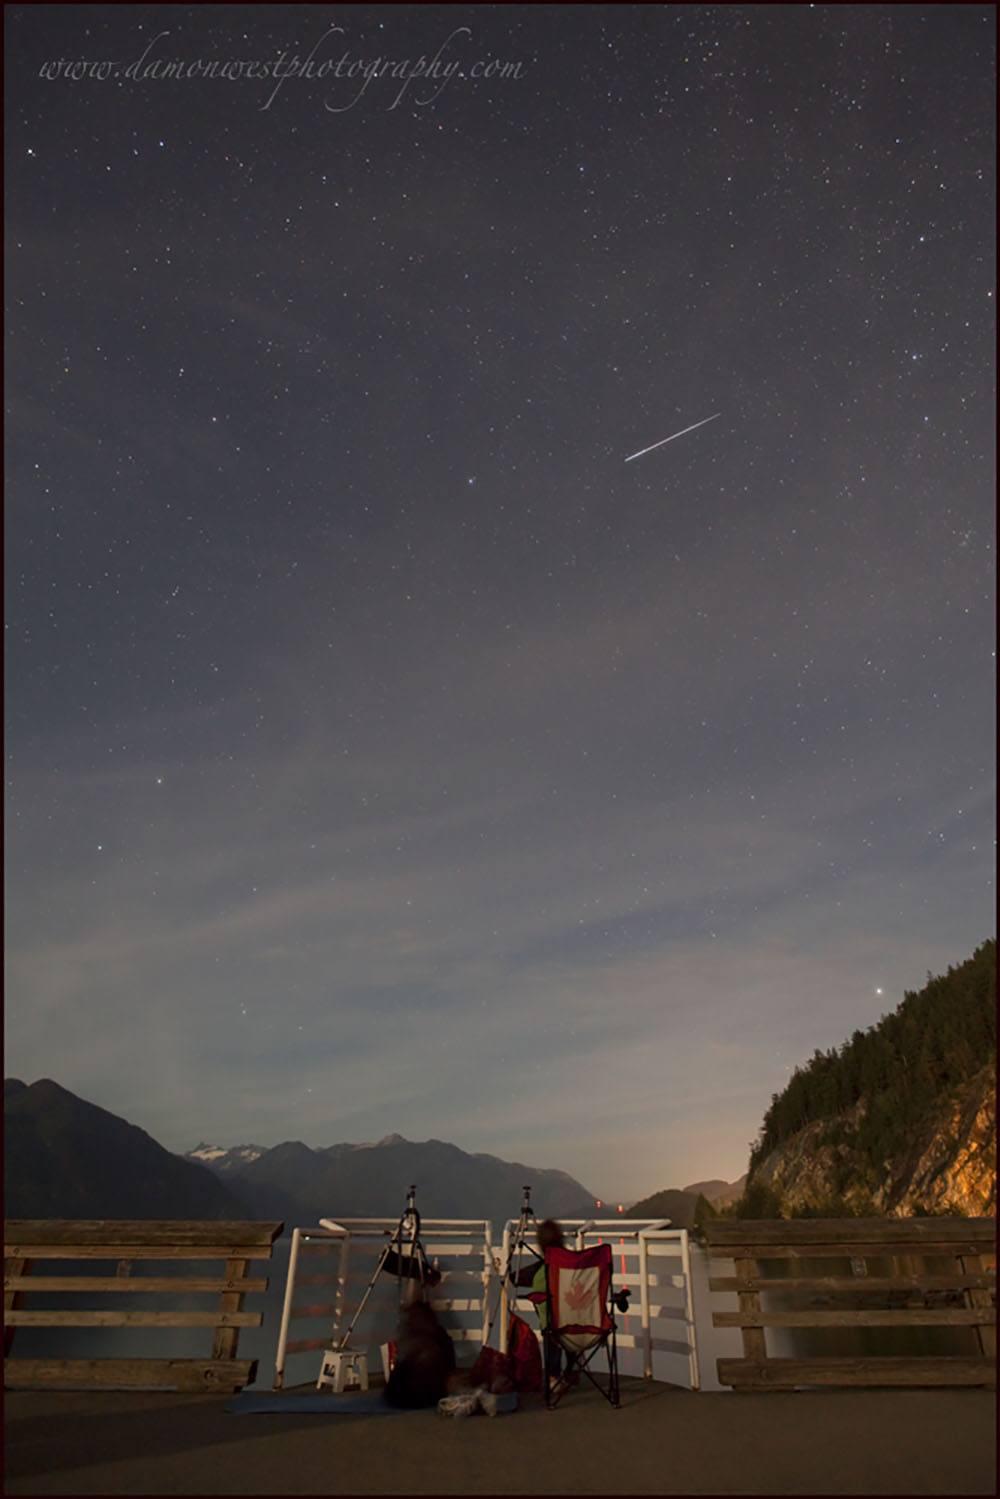 Perseid meteor shower from Porteau Cove (Damon West/Flickr)